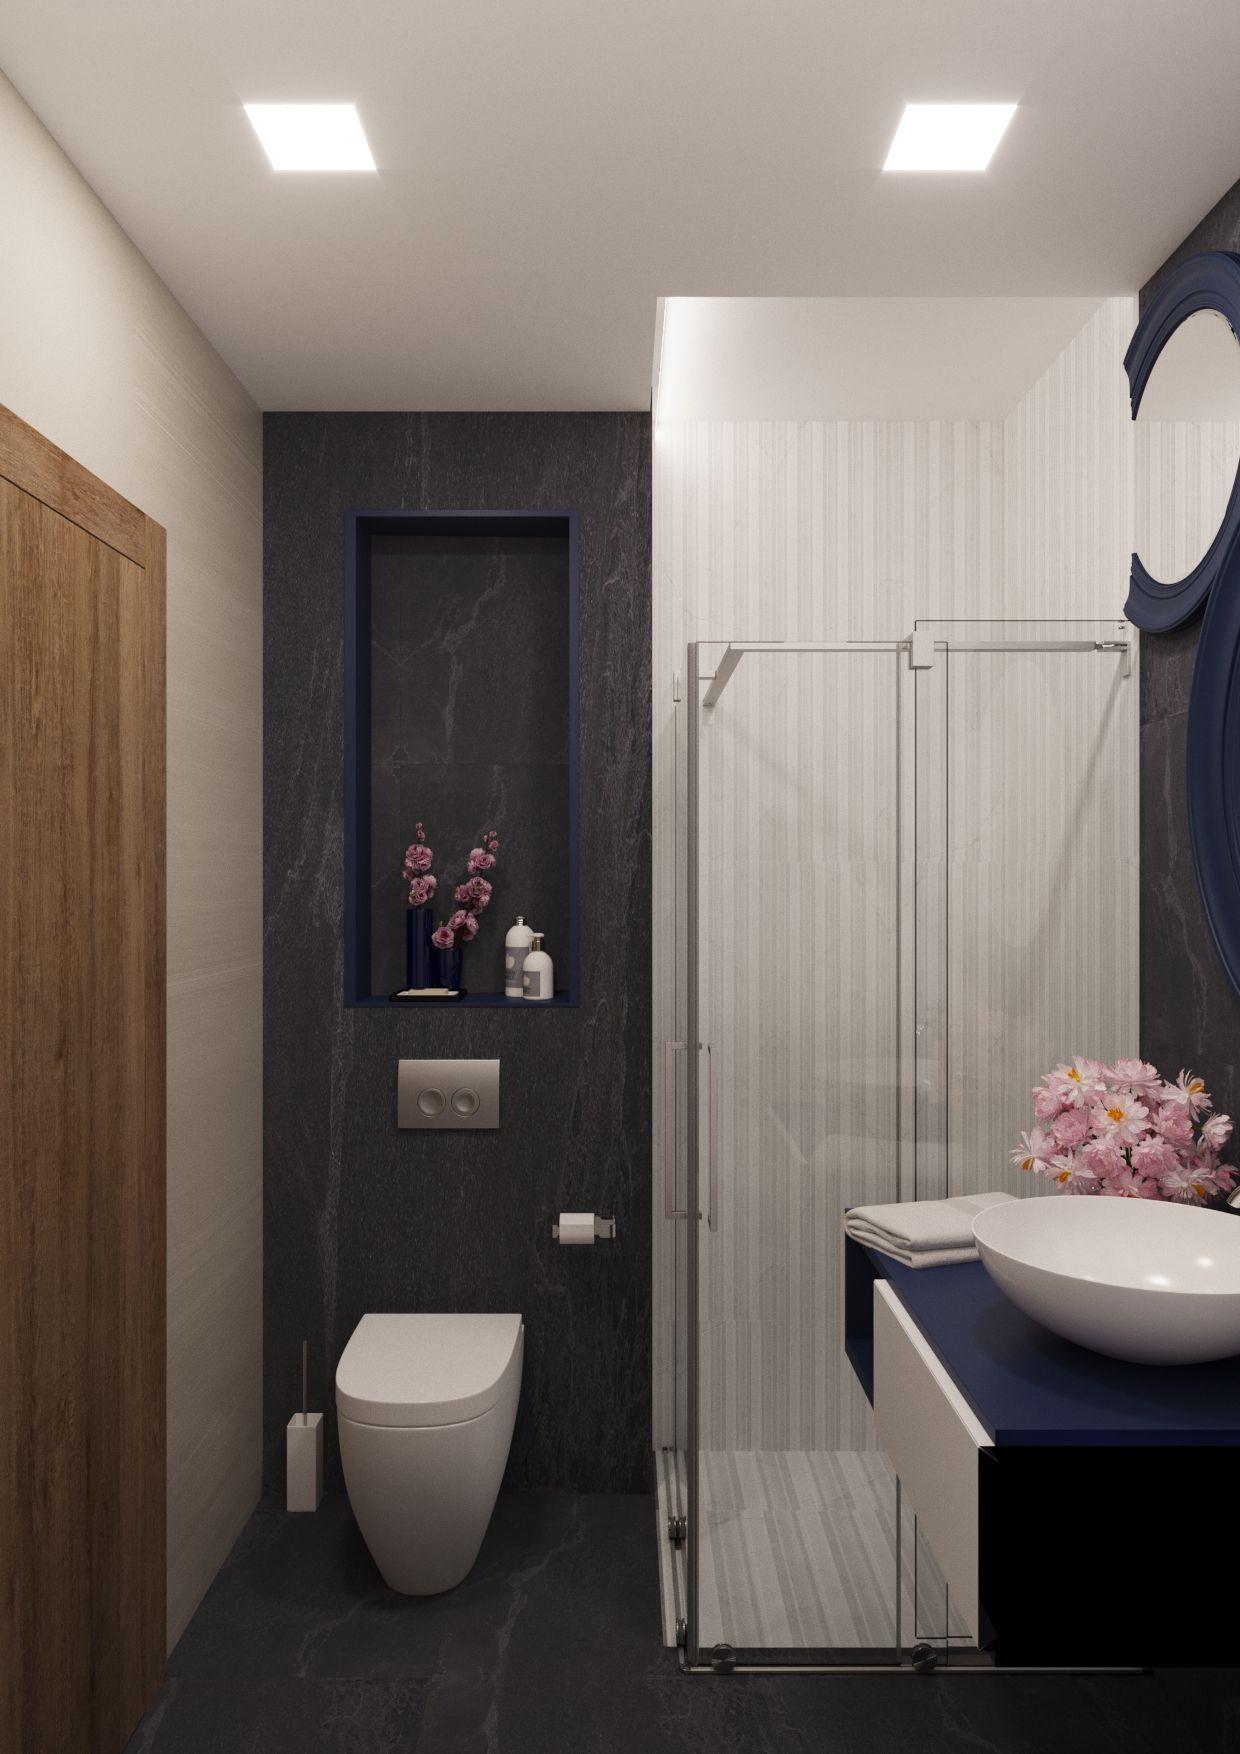 Bathroom Design, Bathroom Idea, Bathroom Interior, Bathroom Inspiration, Bathroom,